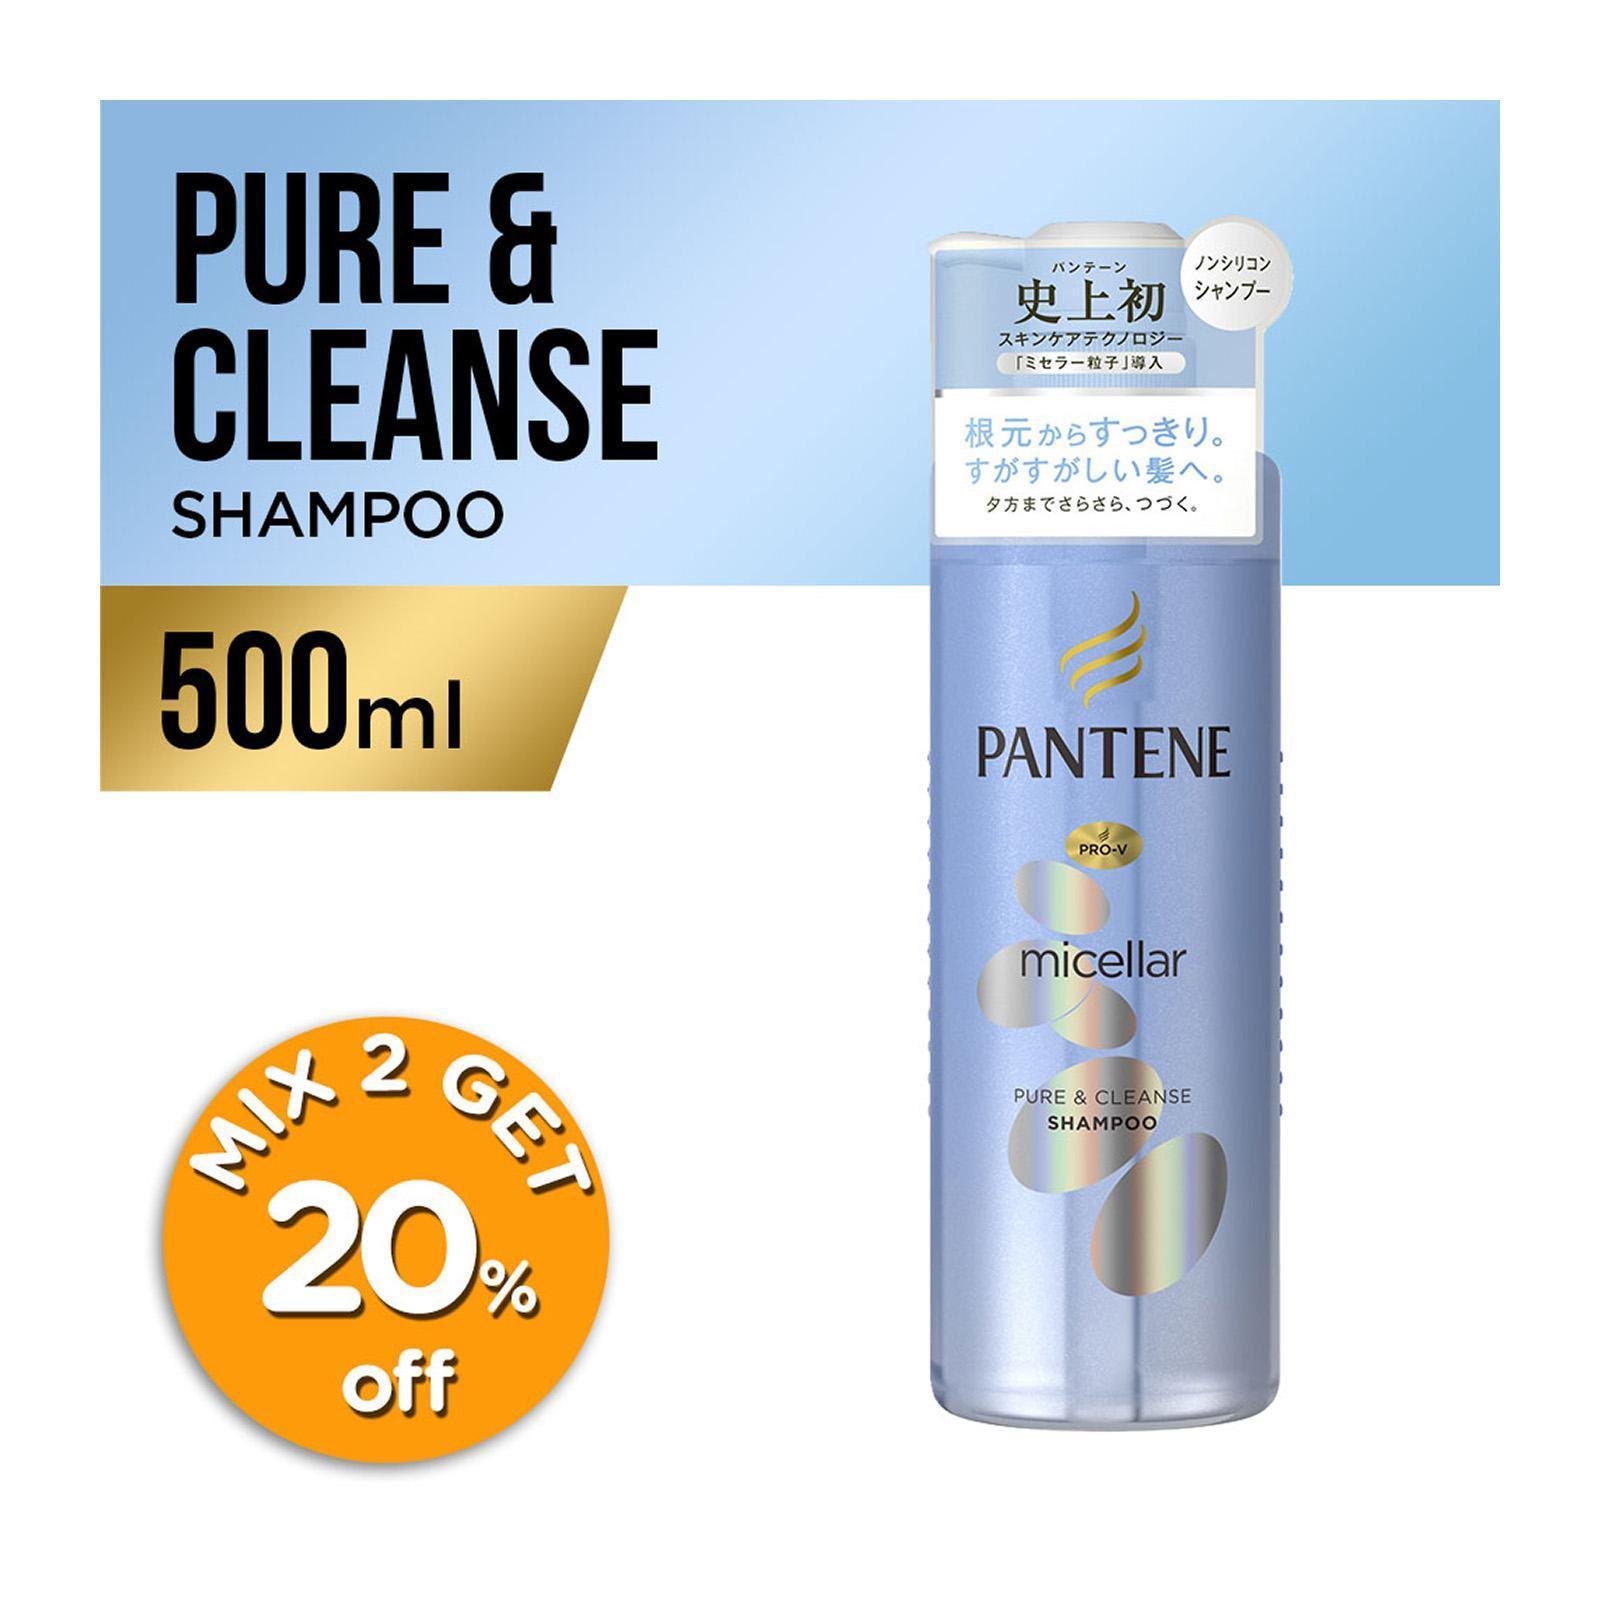 Pantene Micellar Water Pure & Cleanse Shampoo, 500ml